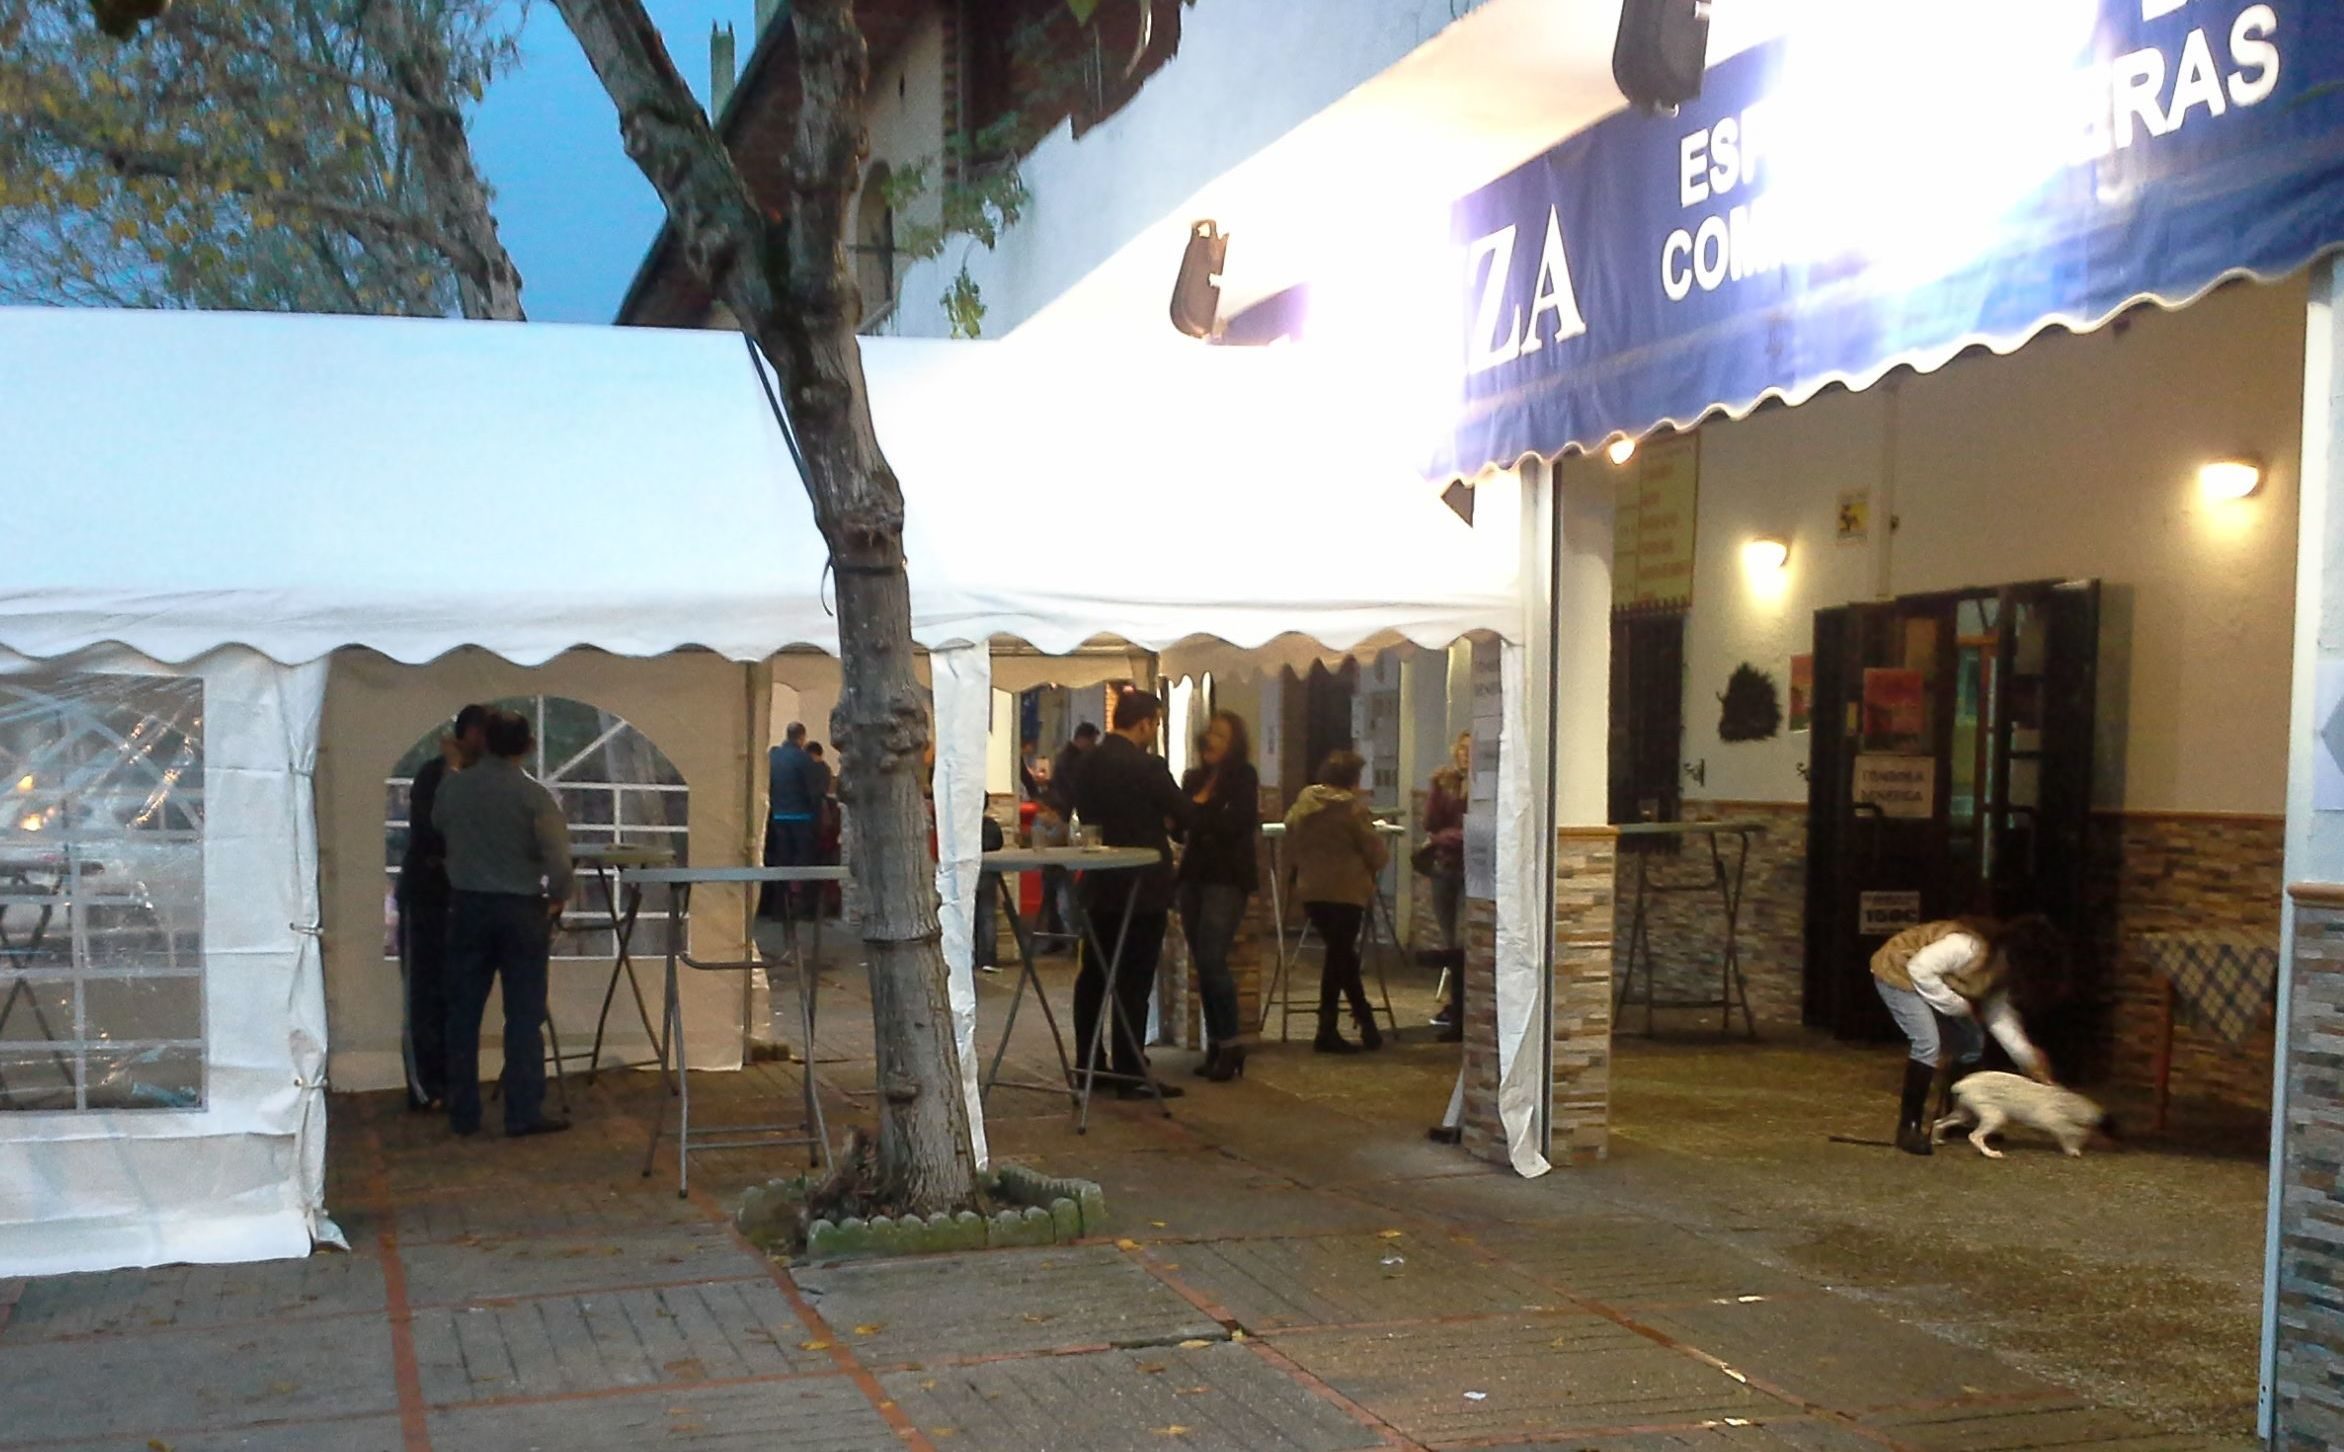 Zambombas Jerezanas 2015: Catálogo de Jedal Alquileres